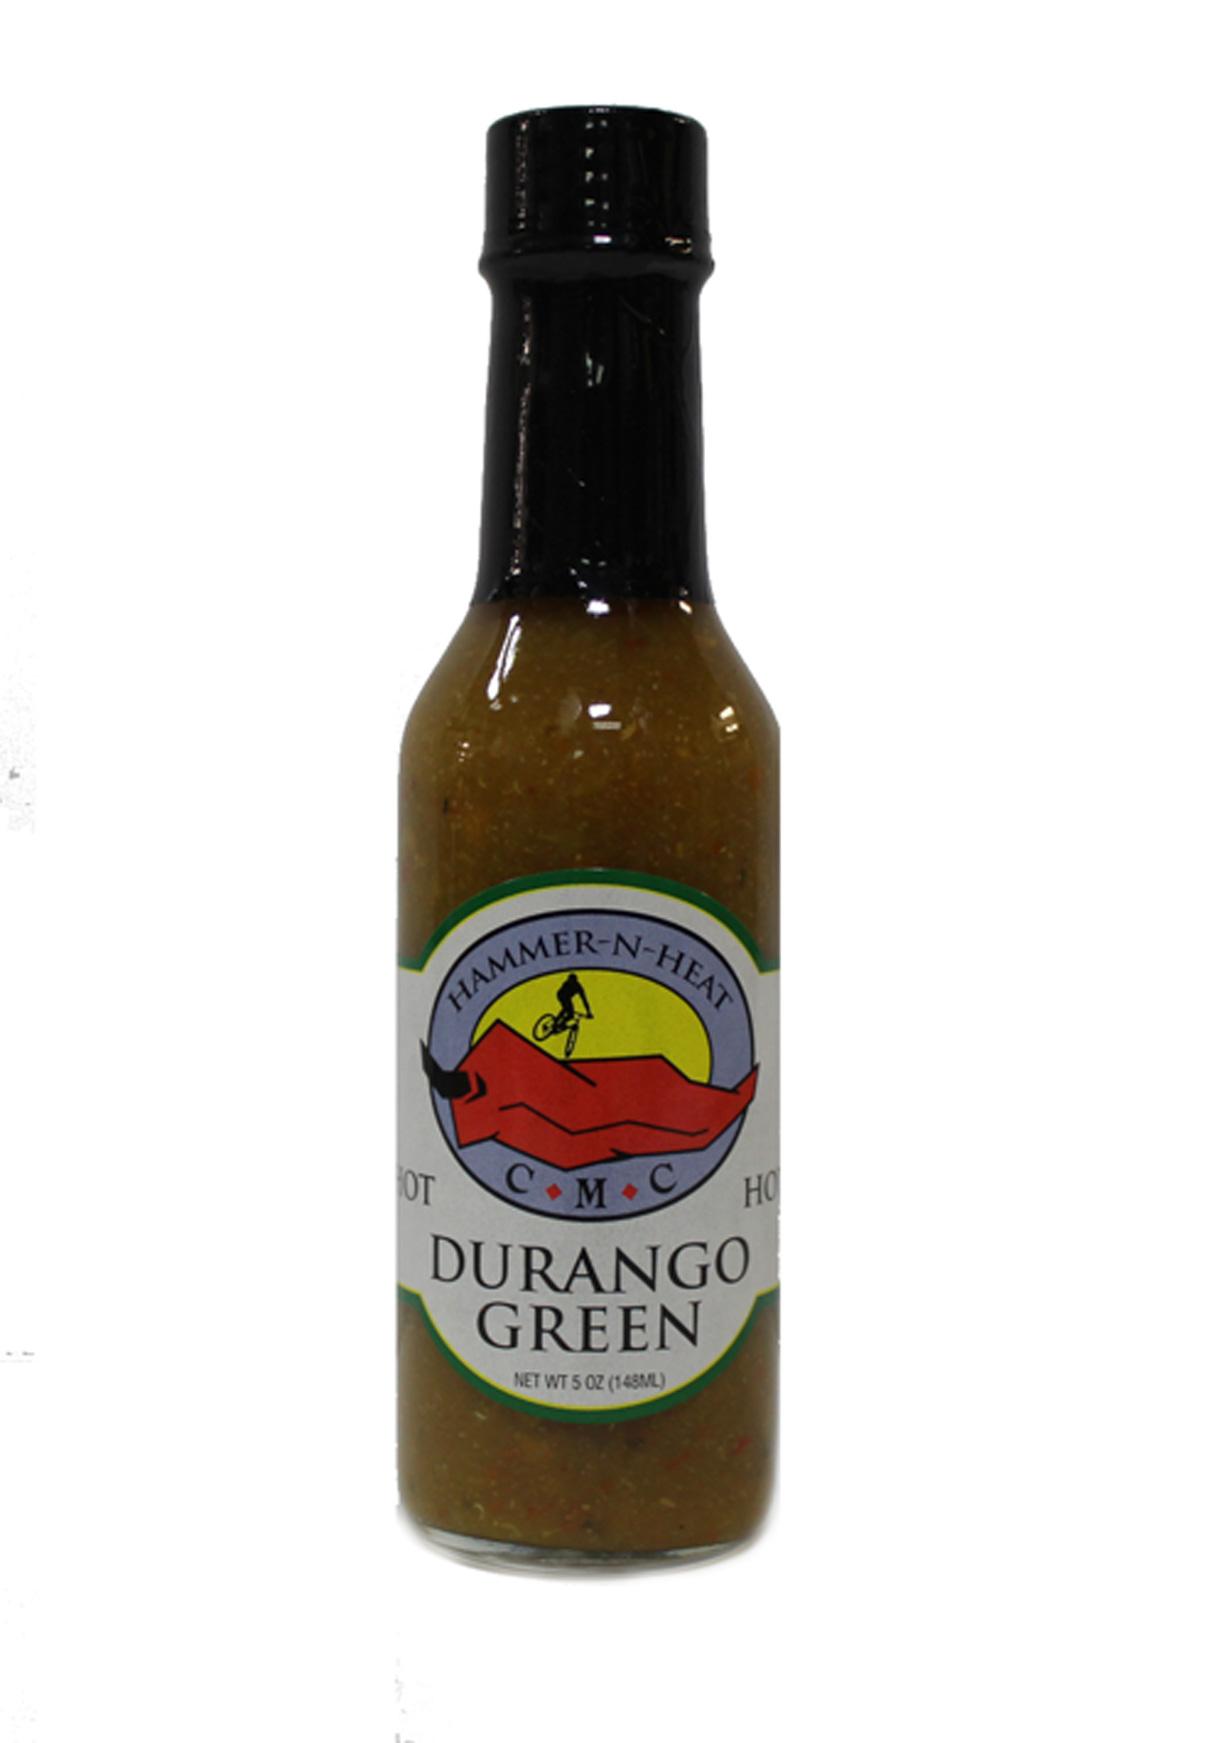 DURANGO GREEN HOT SAUCE (HOT) 5 OZ